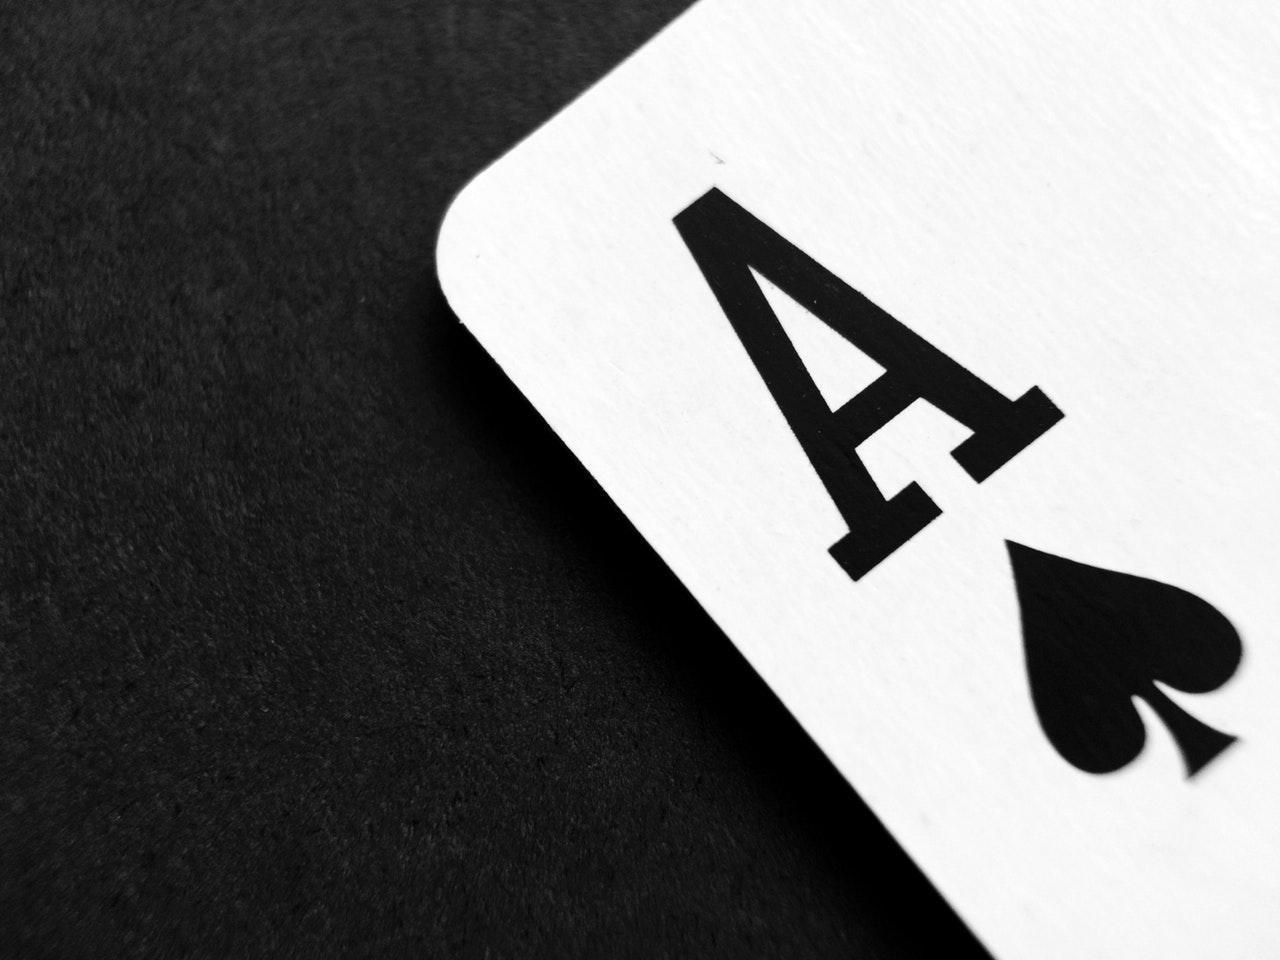 online casino games developers